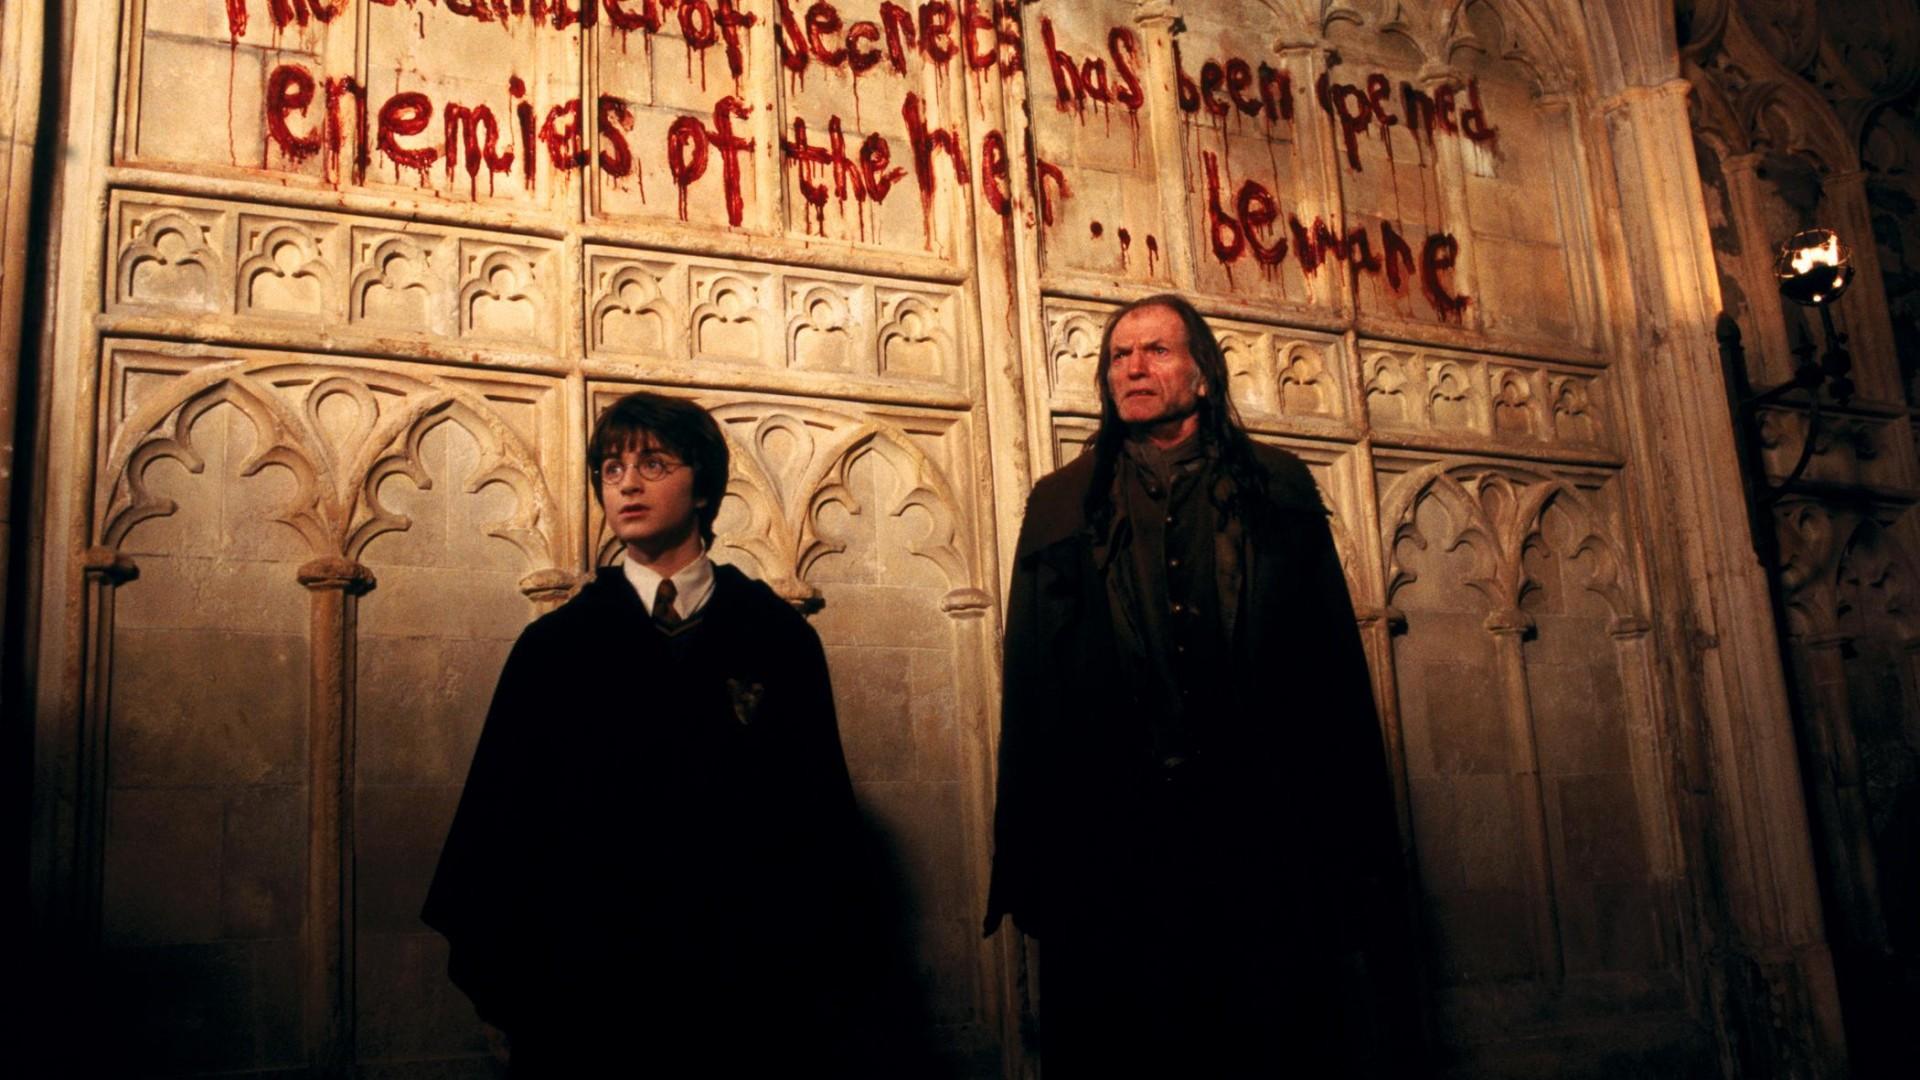 158 1080p Harry Potter